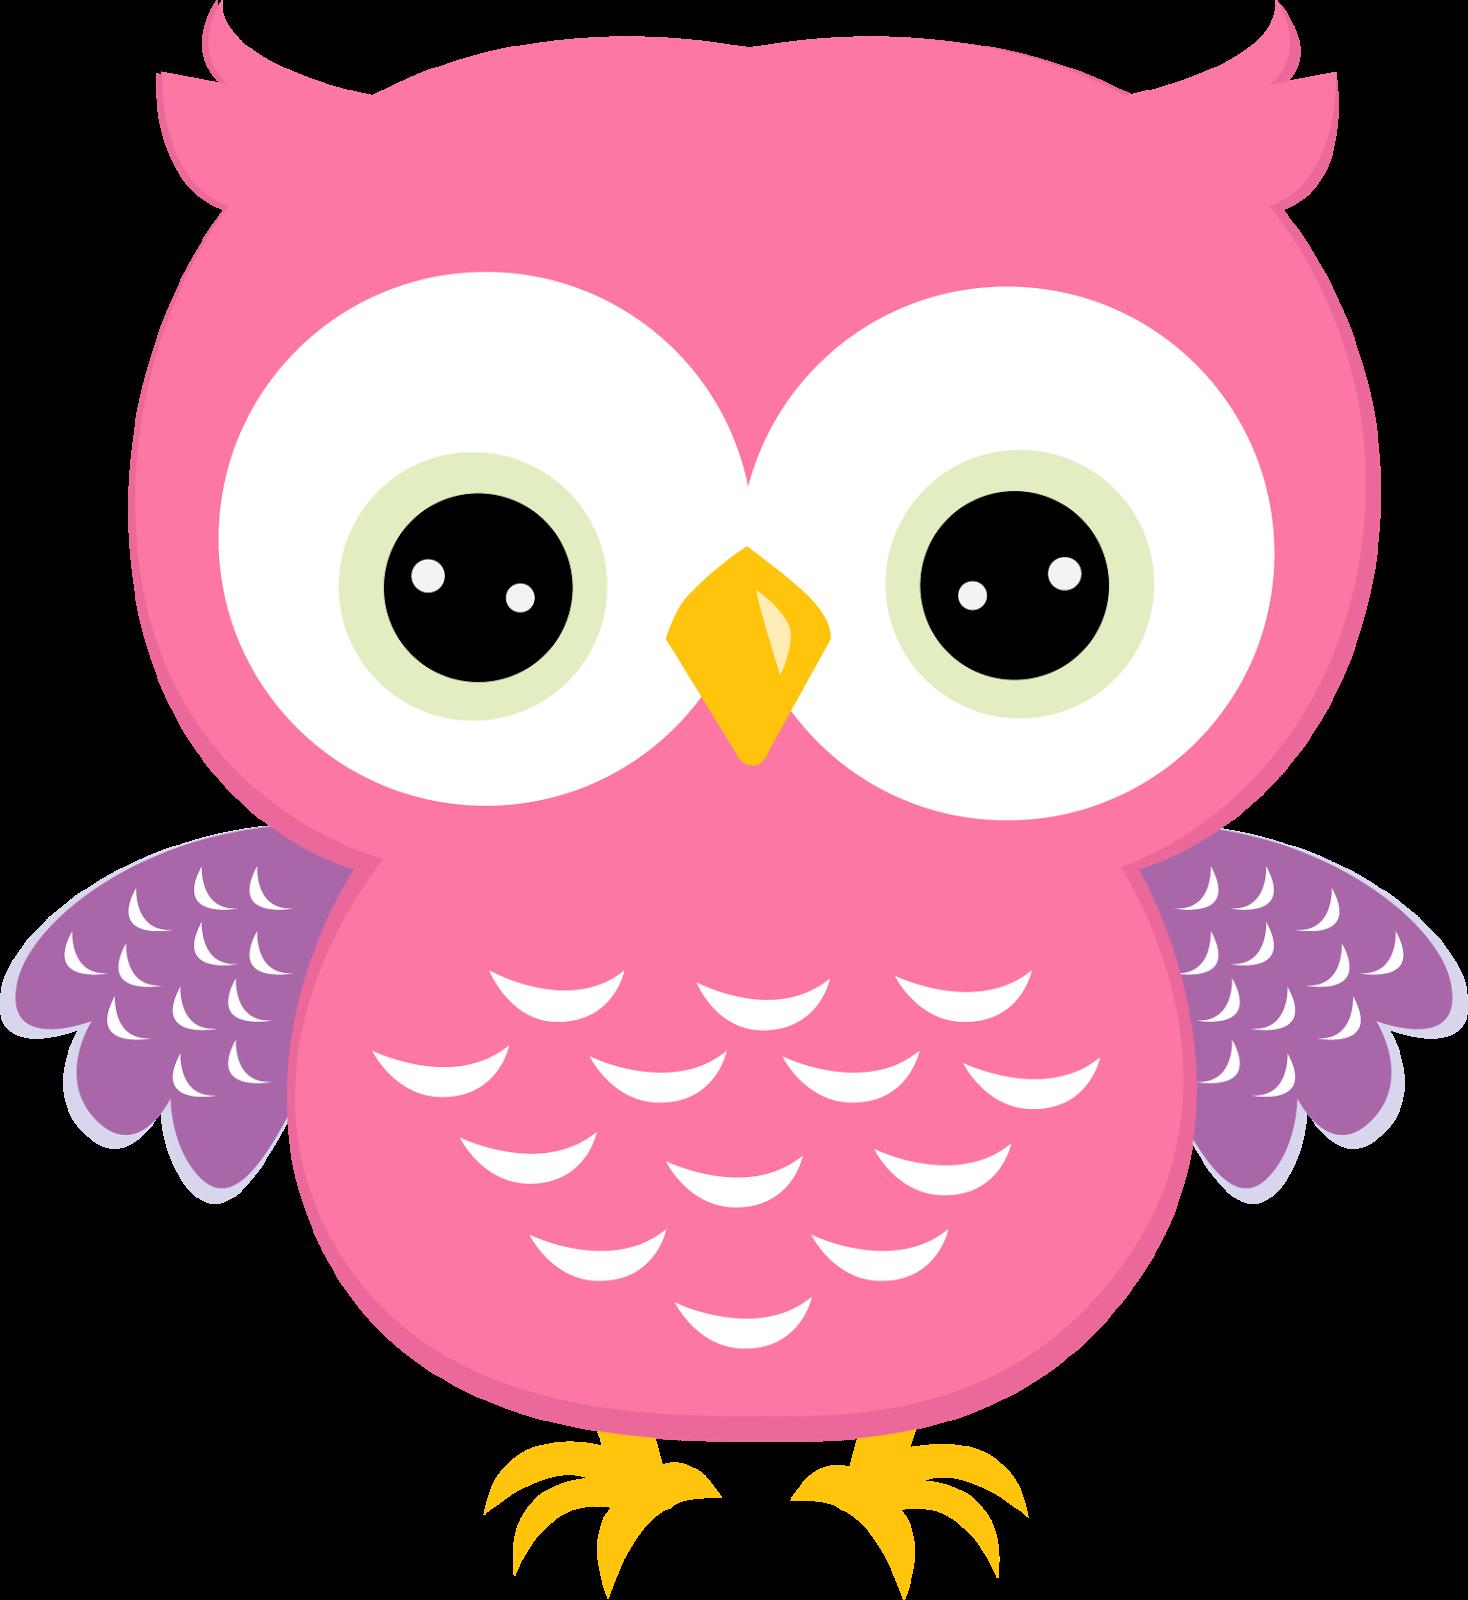 Nurse clipart owl, Nurse owl Transparent FREE for download.